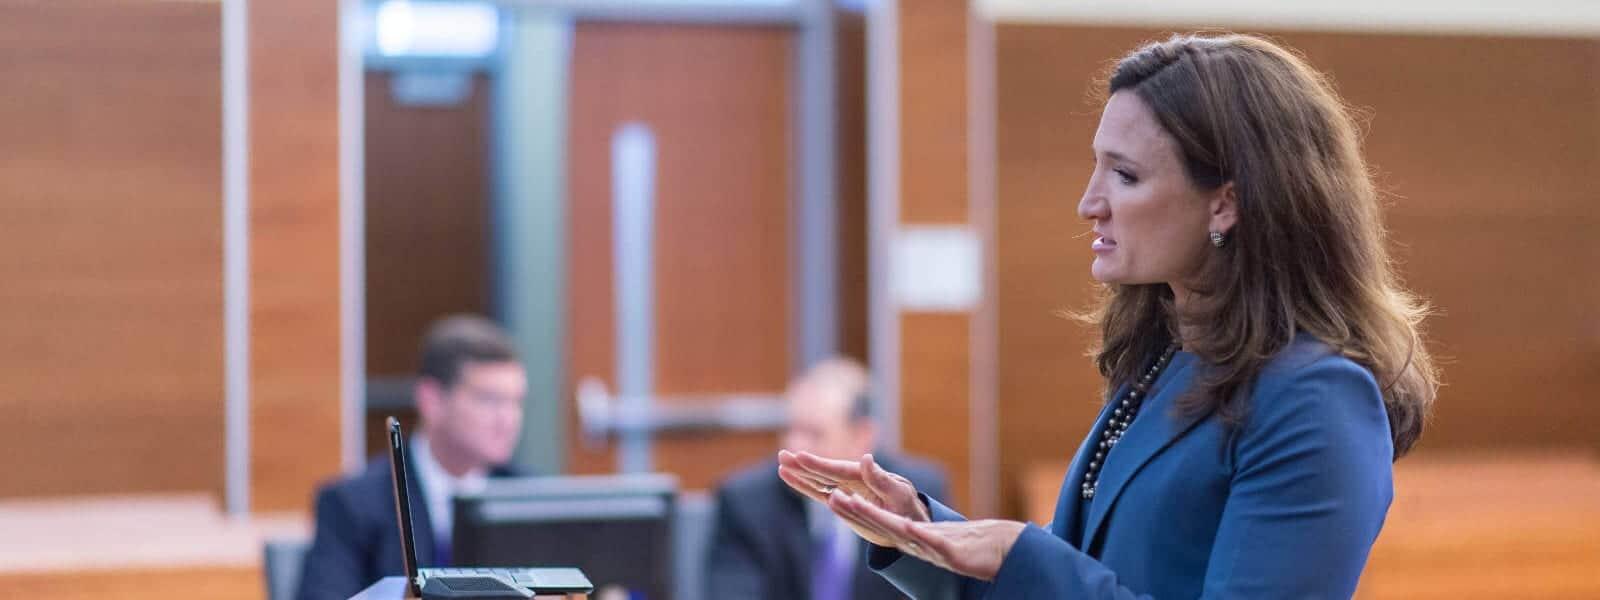 GBM Lawyer Sydney McLafferty defends client in court